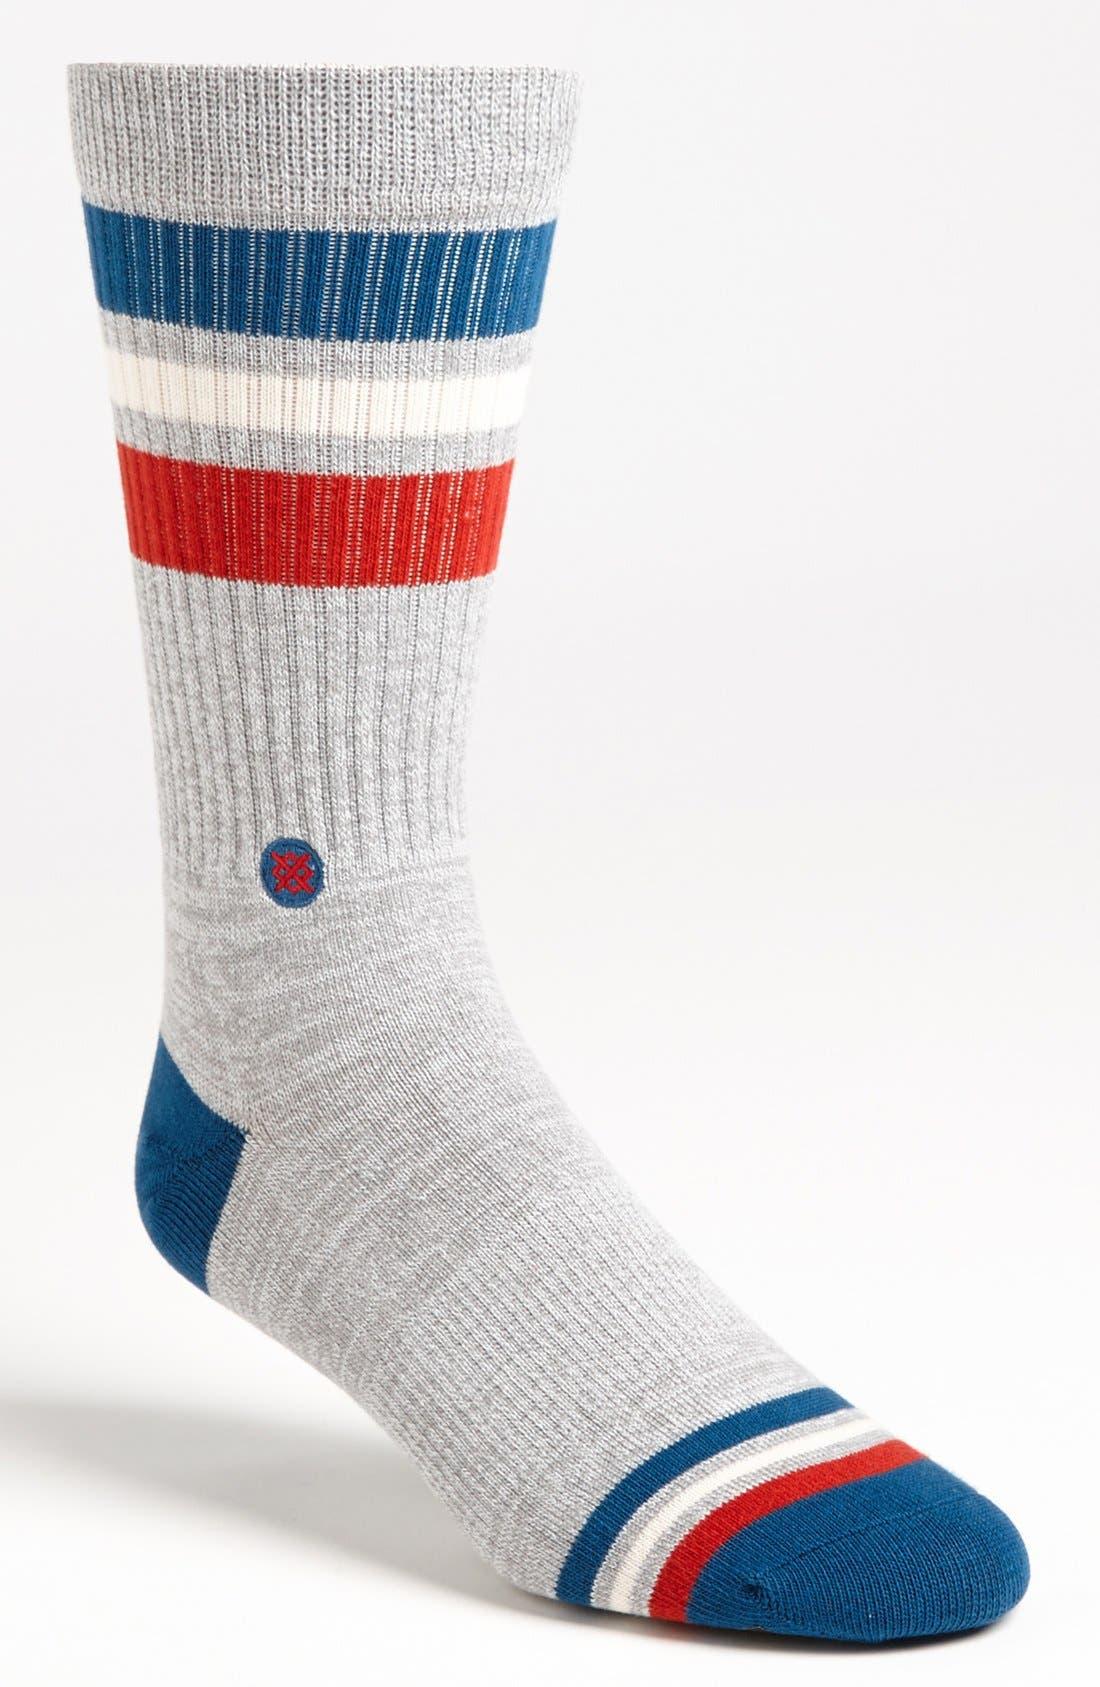 Main Image - Stance 'Garfield' Socks